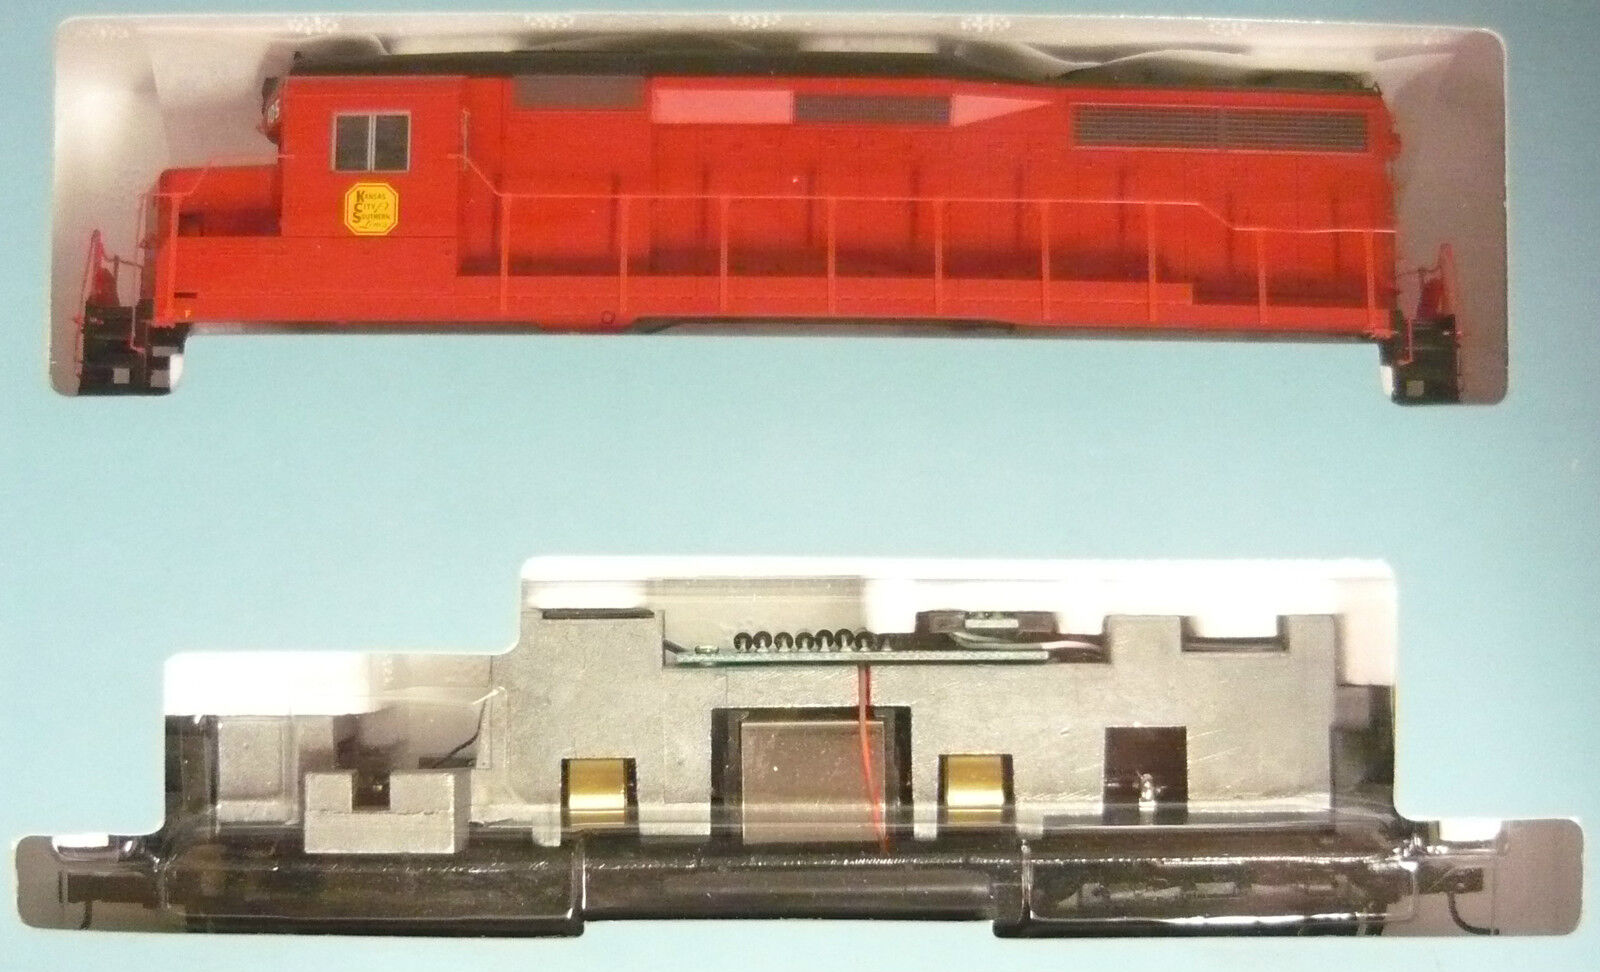 Life Like Predo 2000 21524 GP30 Locomotive KCS 105 New & in Original Box